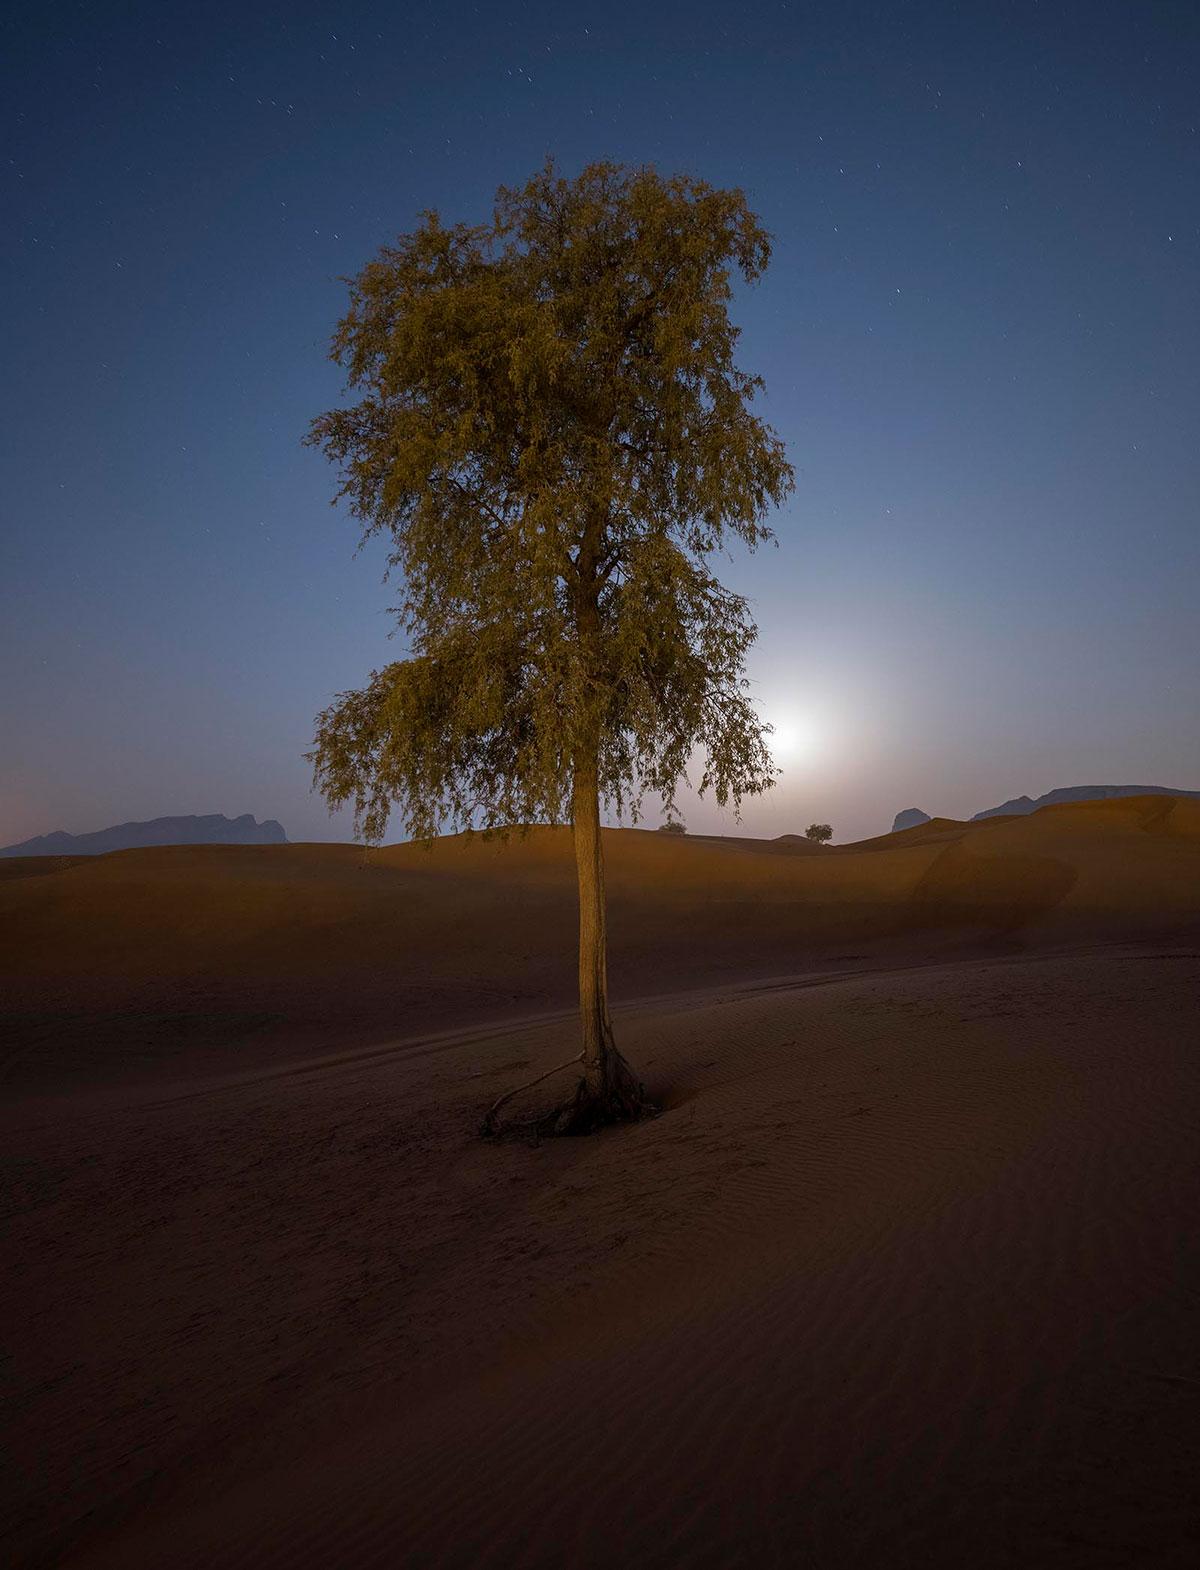 Astro image at the dubai desert